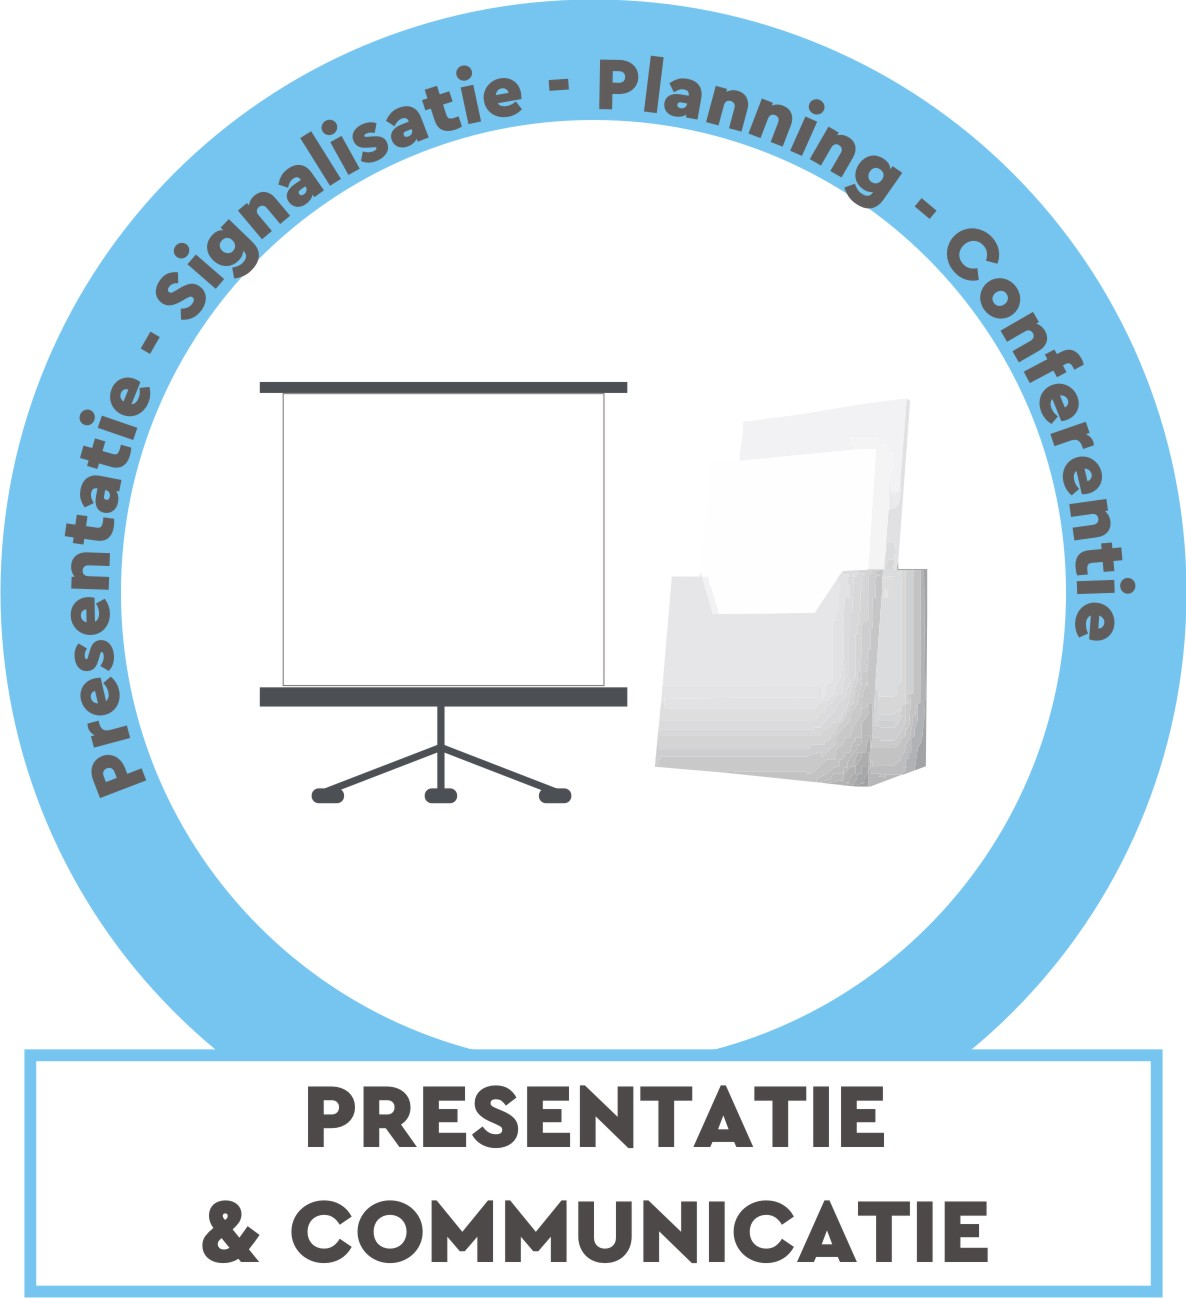 Presentatie, signalisatie, planning, ...